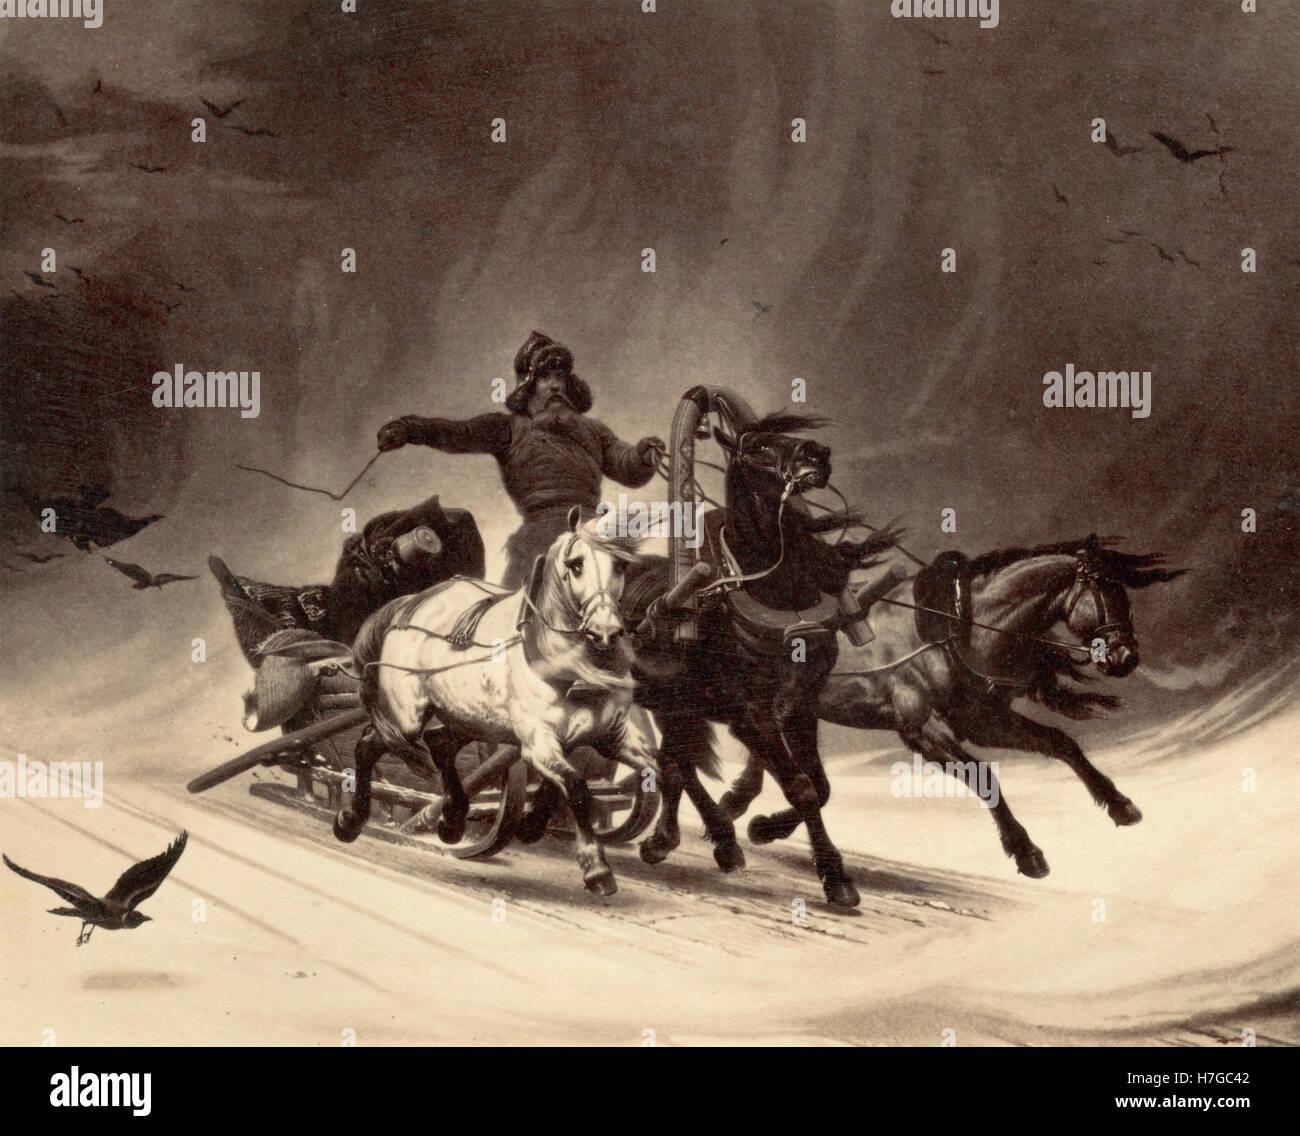 Dashing Russian coachman, Victorian Age print - Stock Image